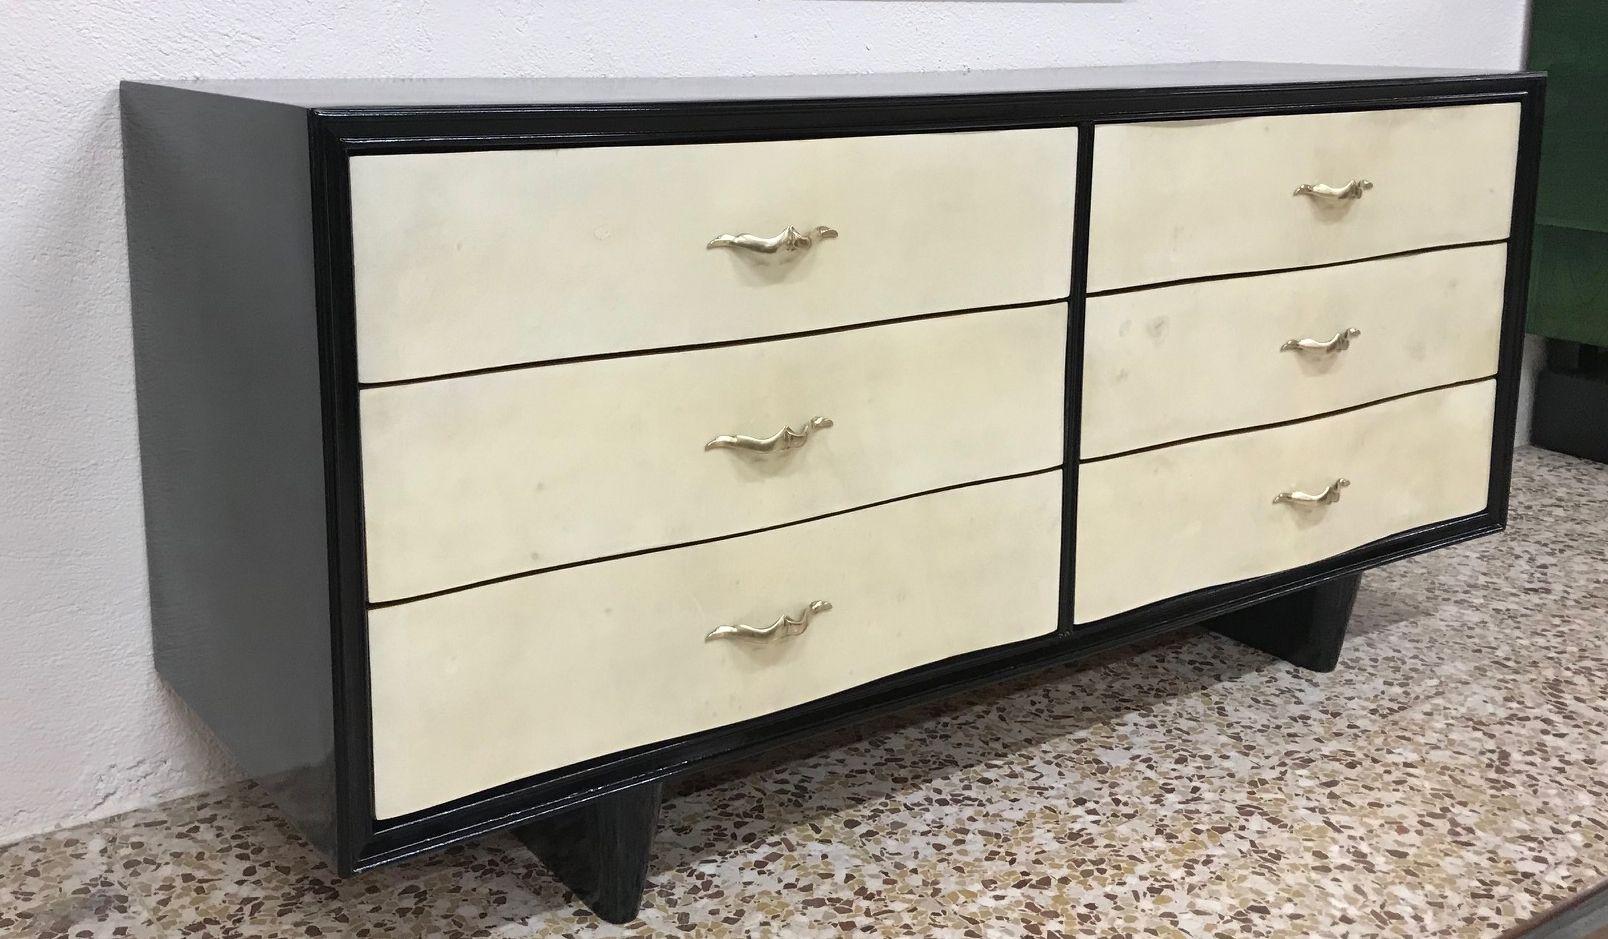 art deco pergament kommode 1940er bei pamono kaufen. Black Bedroom Furniture Sets. Home Design Ideas